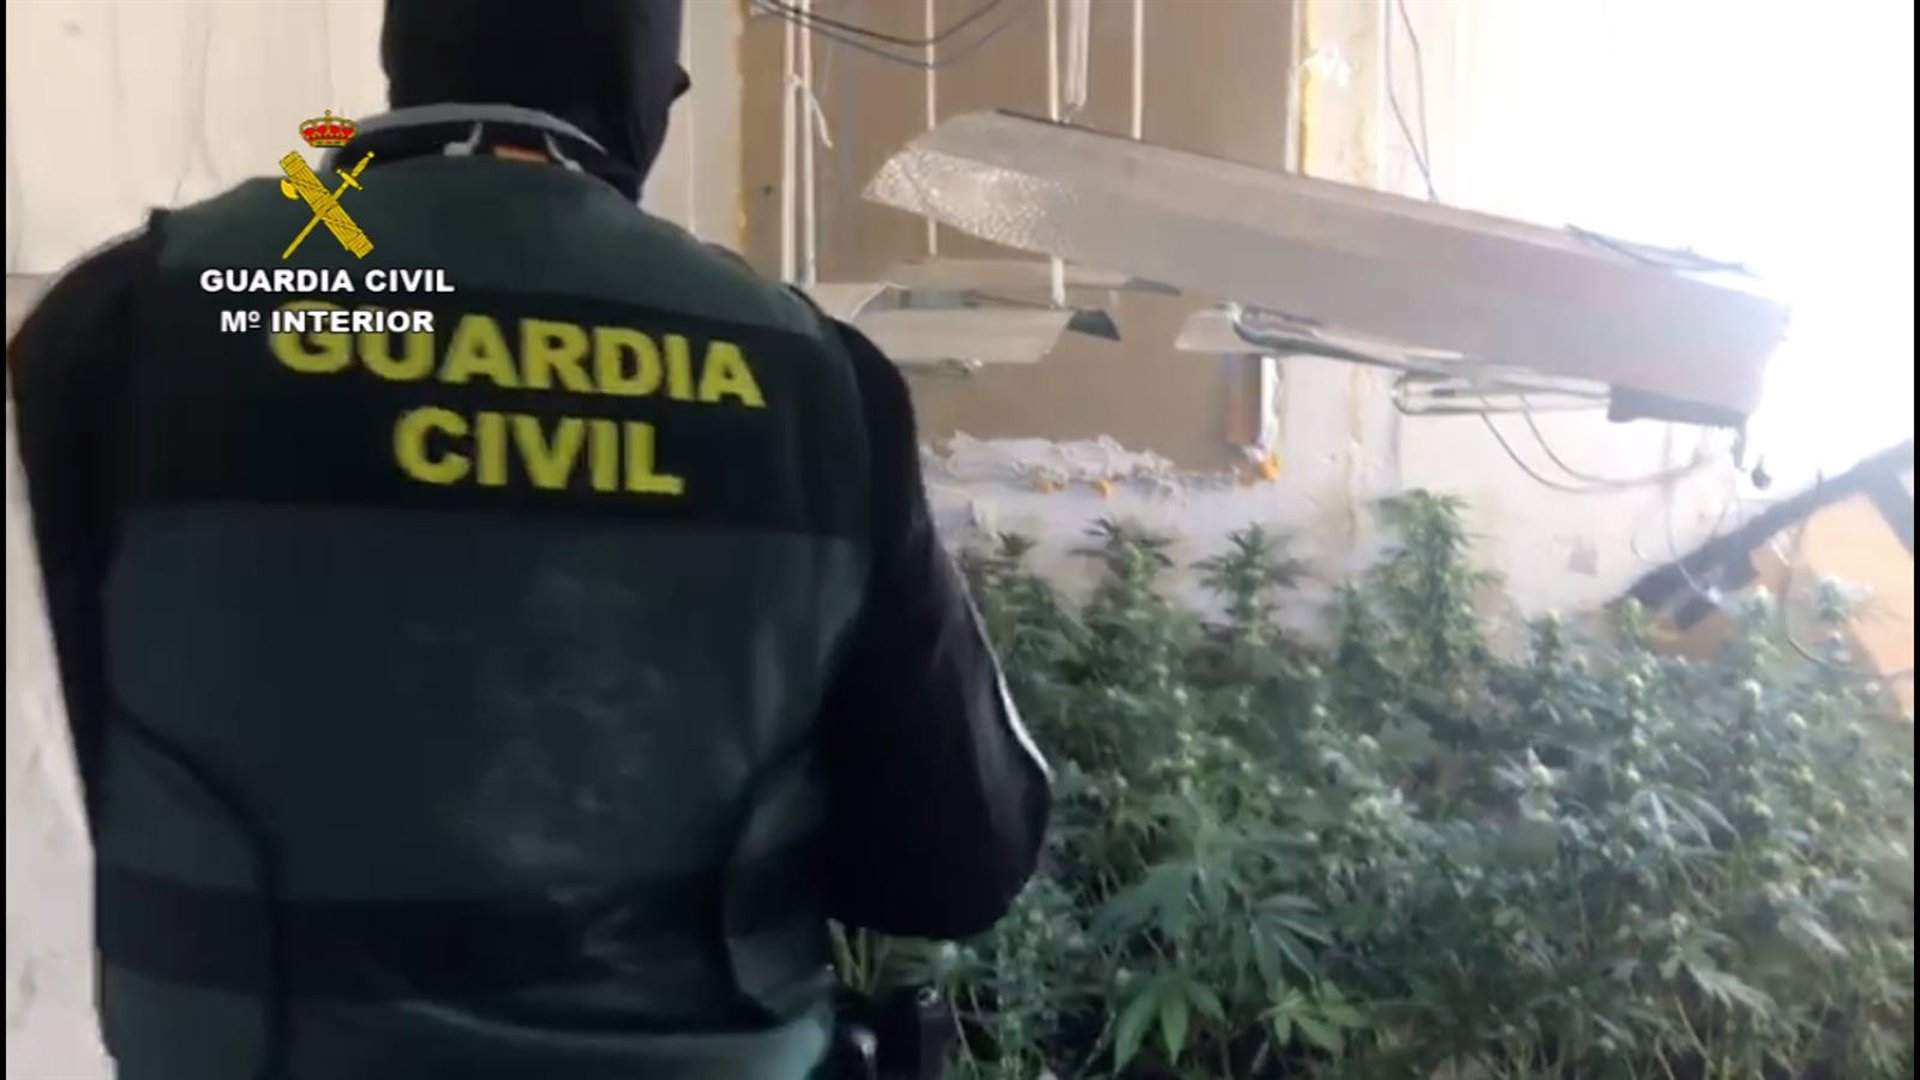 Detenido un joven en Roquetas de Mar como responsable de un cultivo de 93 plantas de marihuana